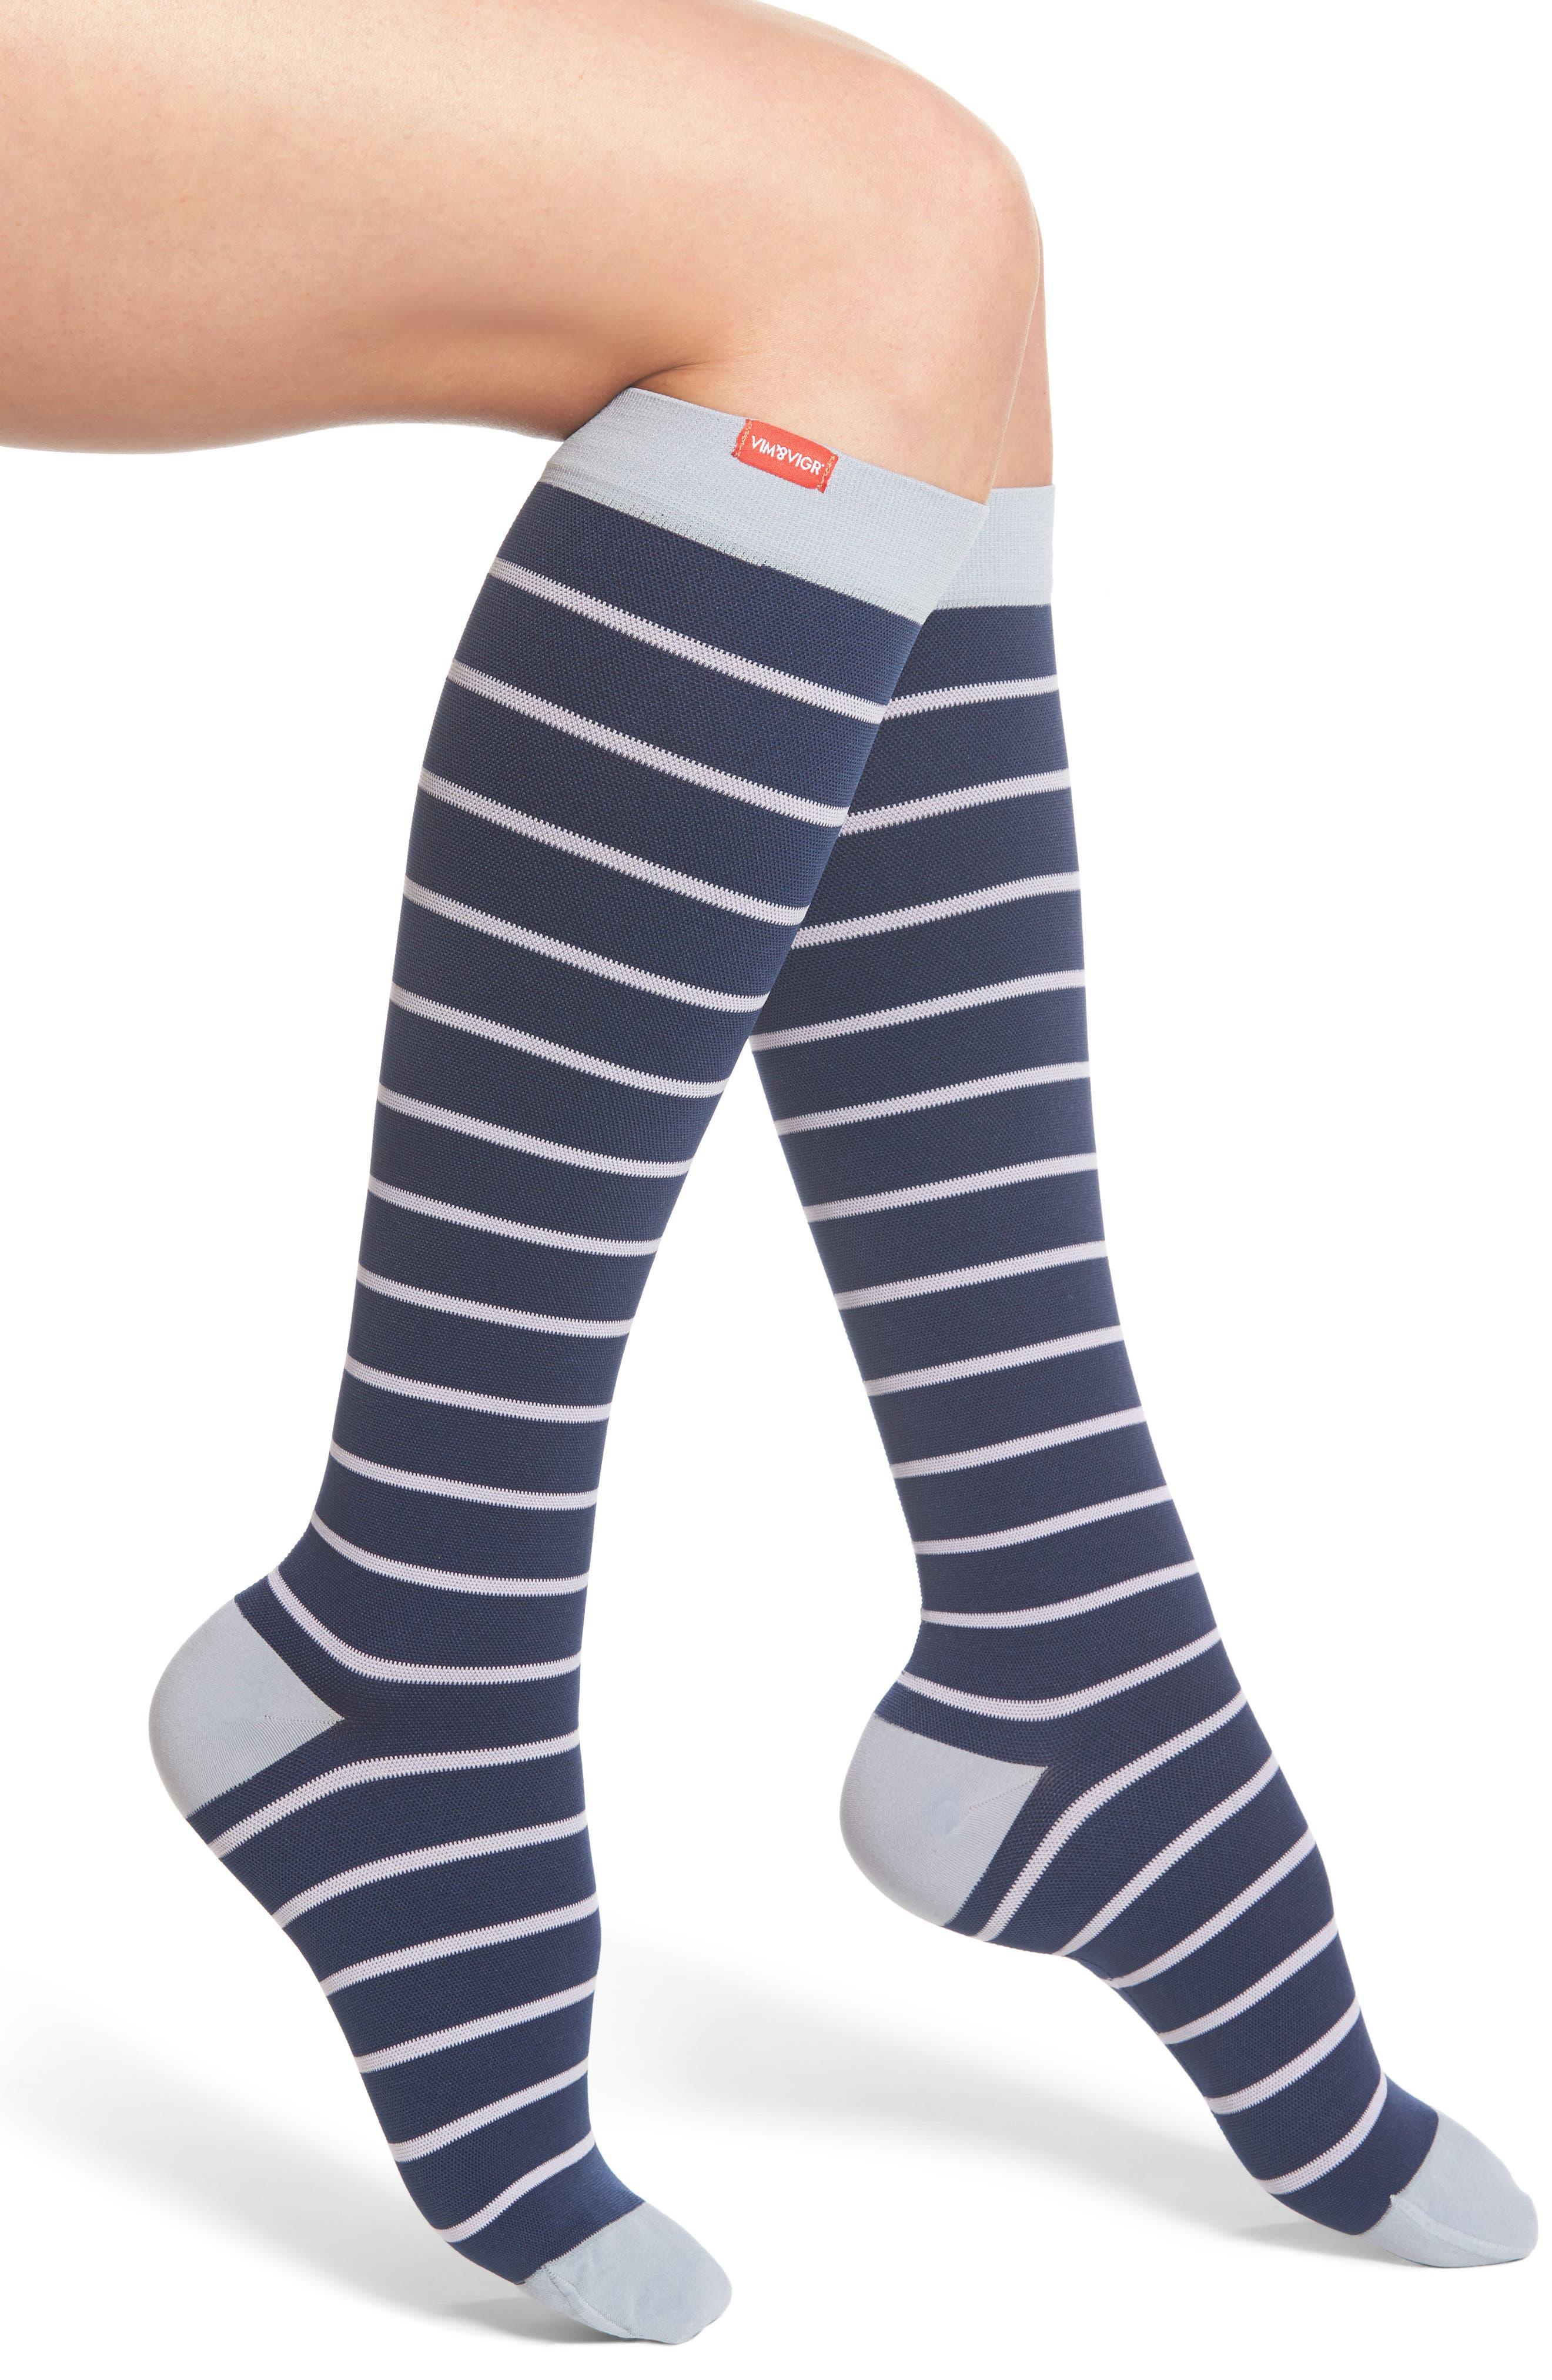 Main Image - VIM & VIGR Nautical Stripe Graduated Compression Trouser Socks